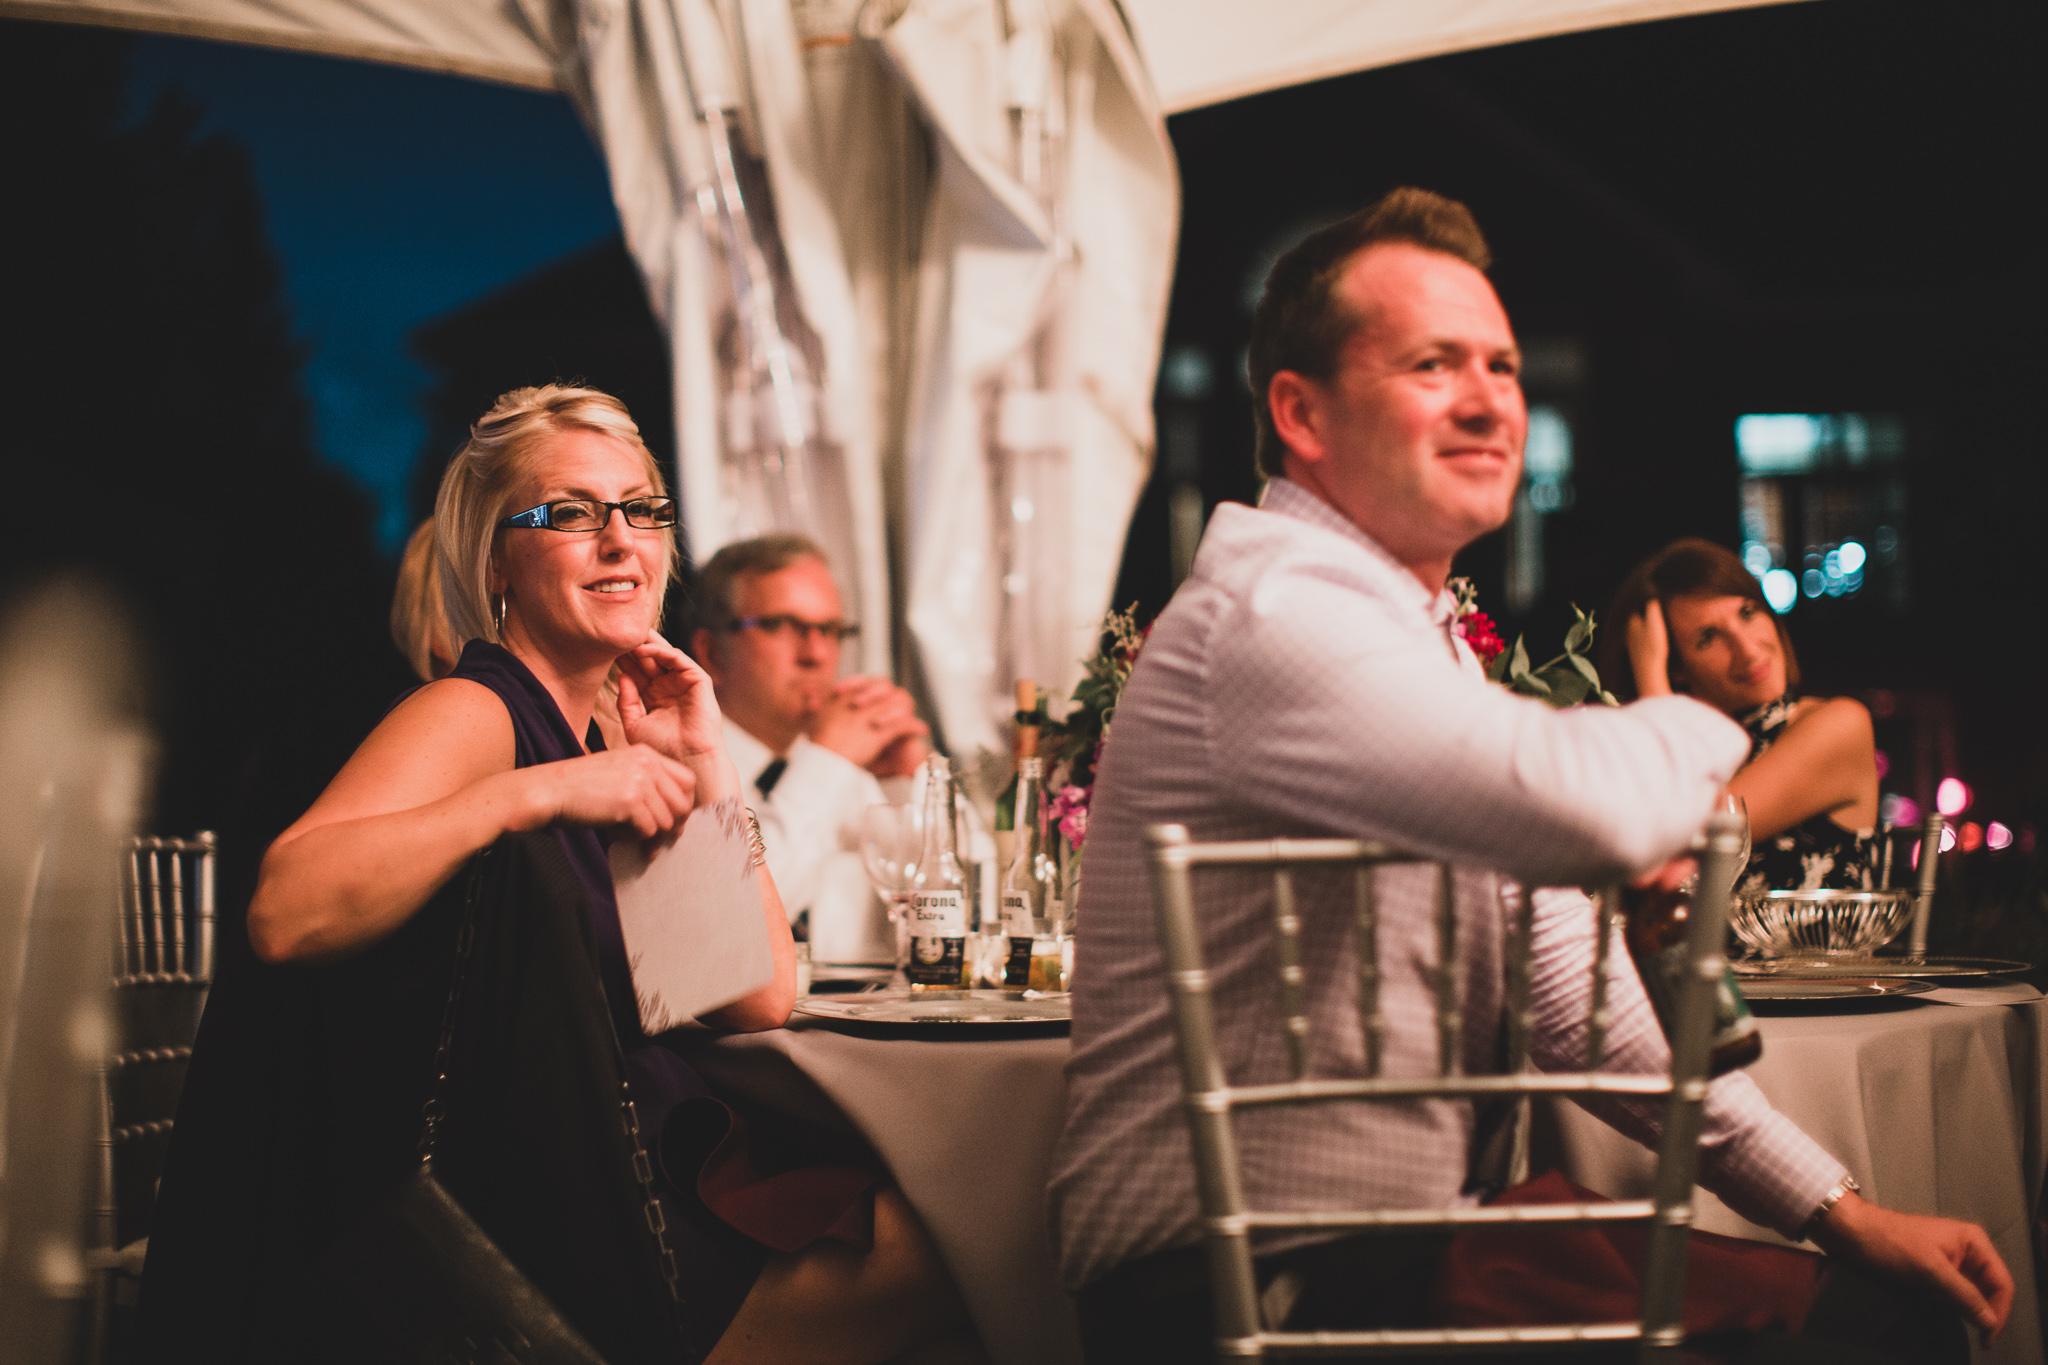 Evening & reception wedding coverage